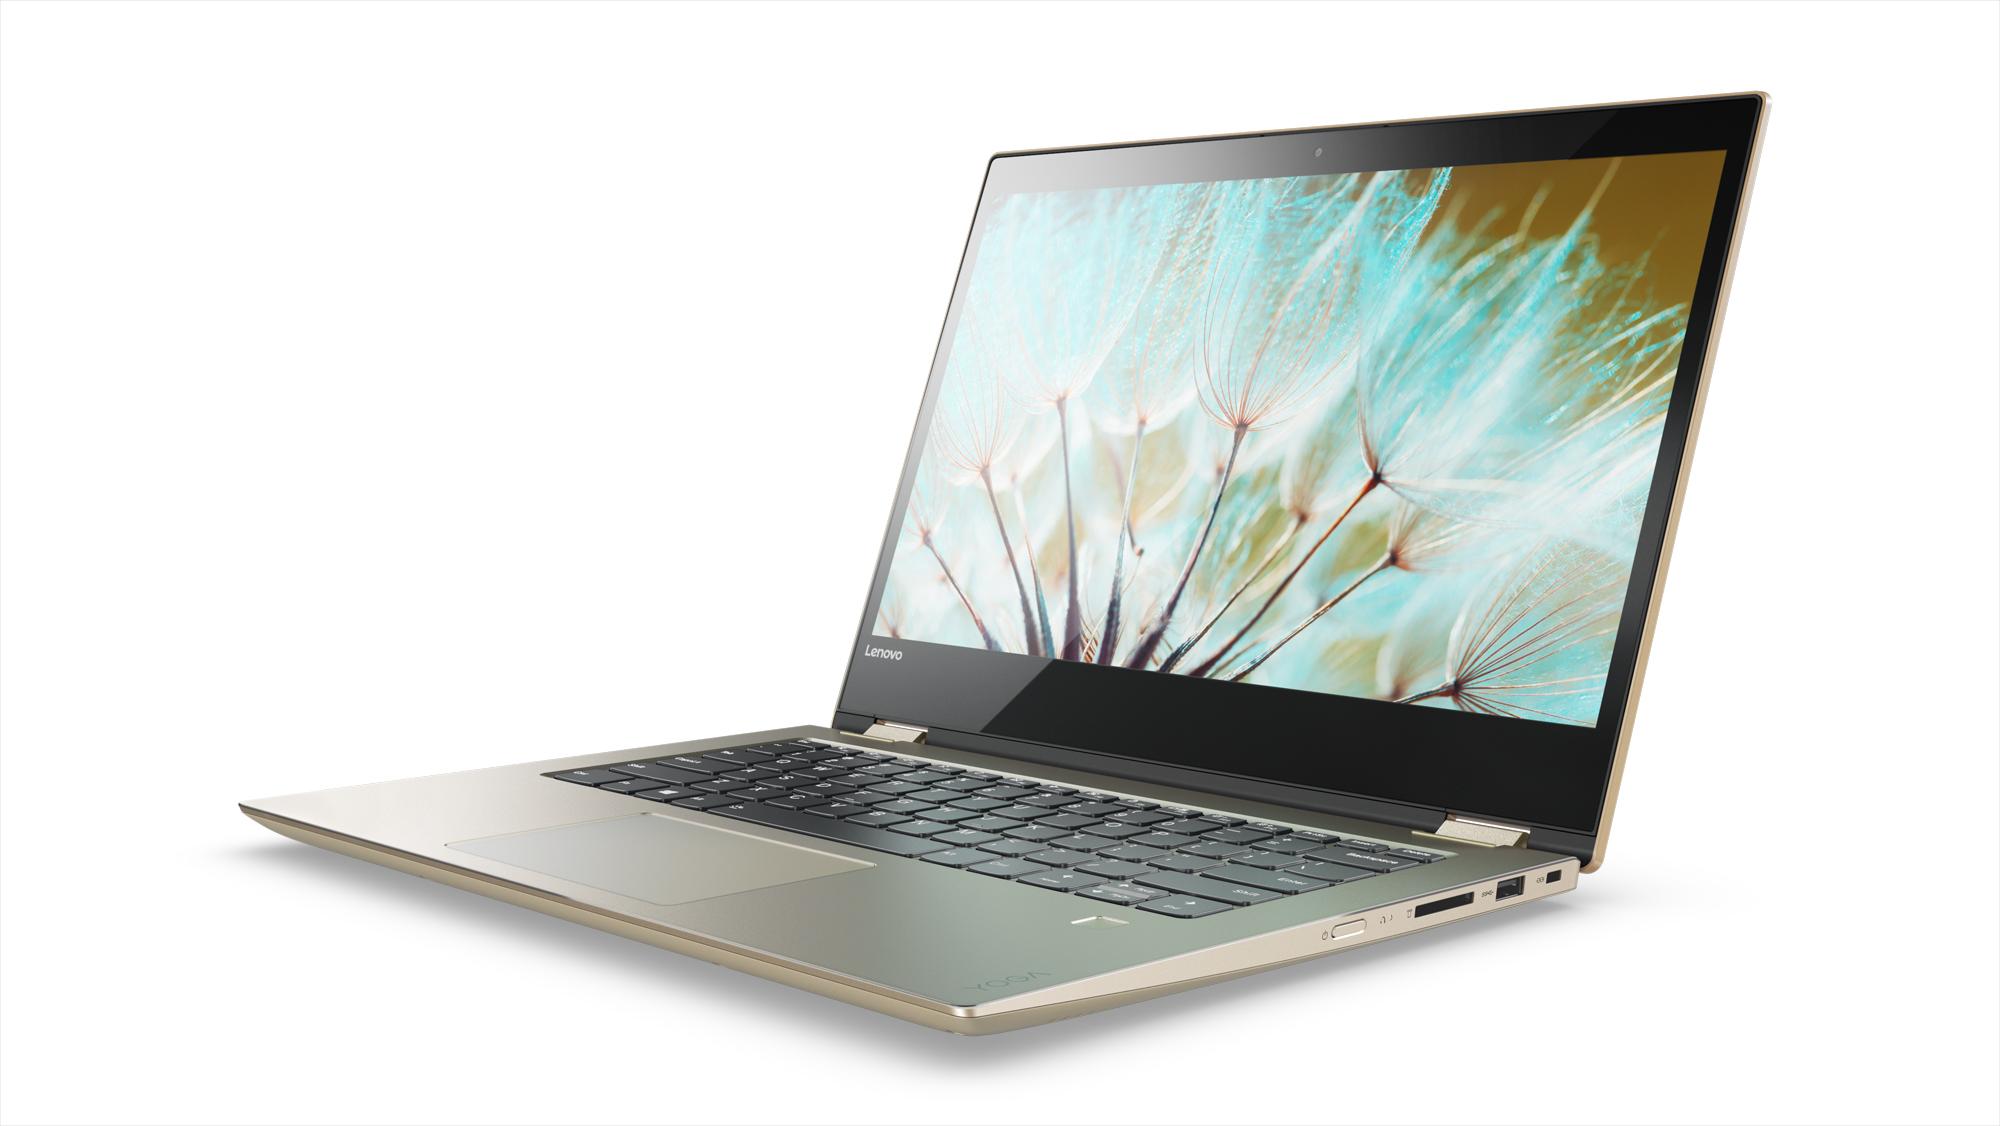 "Lenovo YOGA 520-14IKB i5-7200U 3,10GHz/8GB/SSD 256GB/14"" FHD/IPS/multitouch/FPR/WIN10 zlatá 80X80039CK"